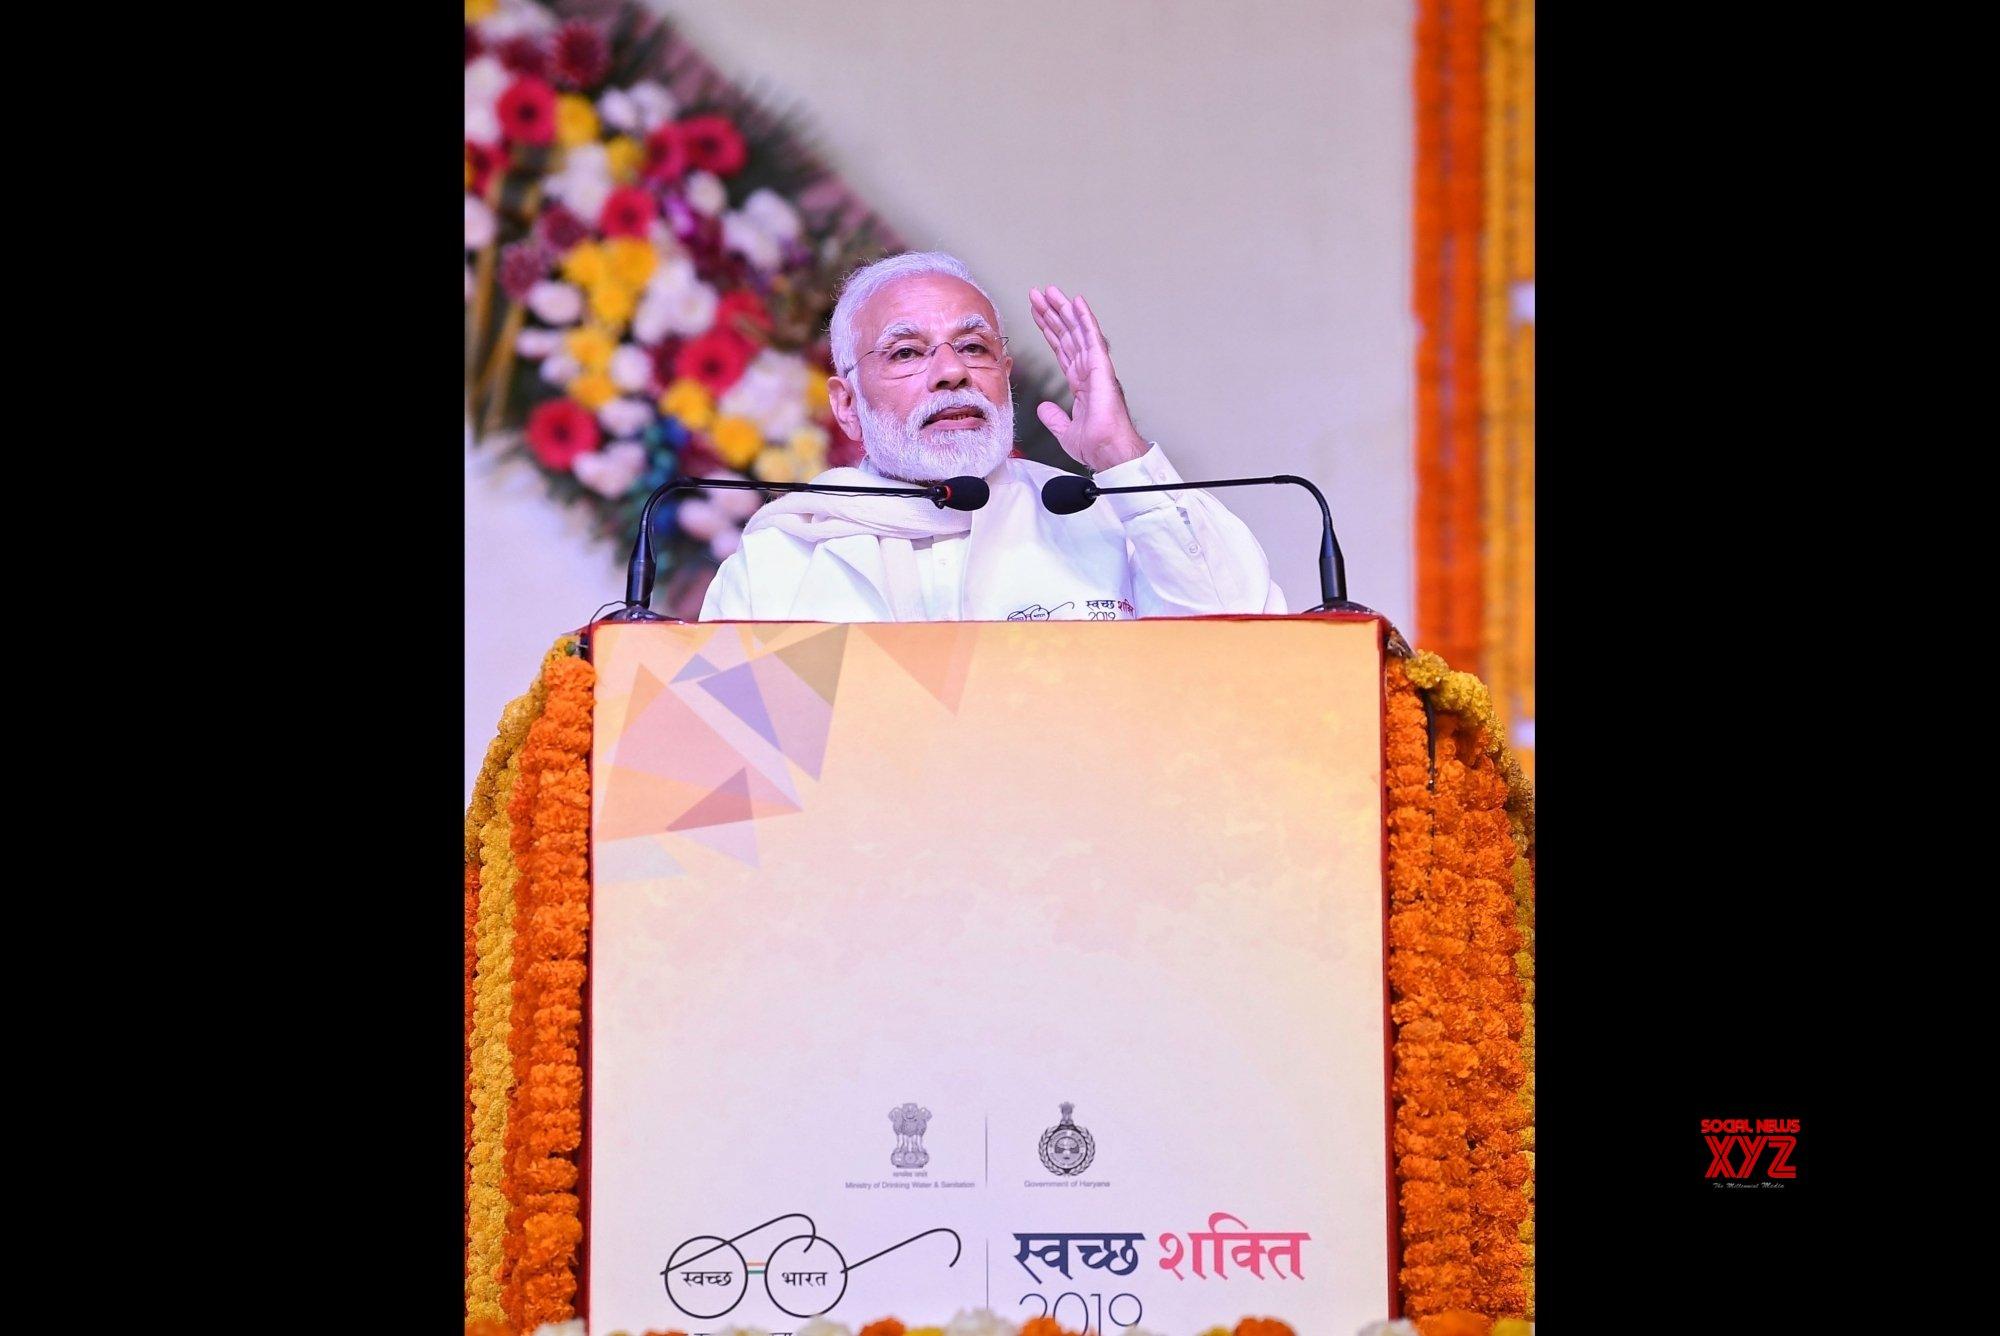 Kurukshetra (Haryana): Swachh Shakti 2019 programme - PM Modi #Gallery